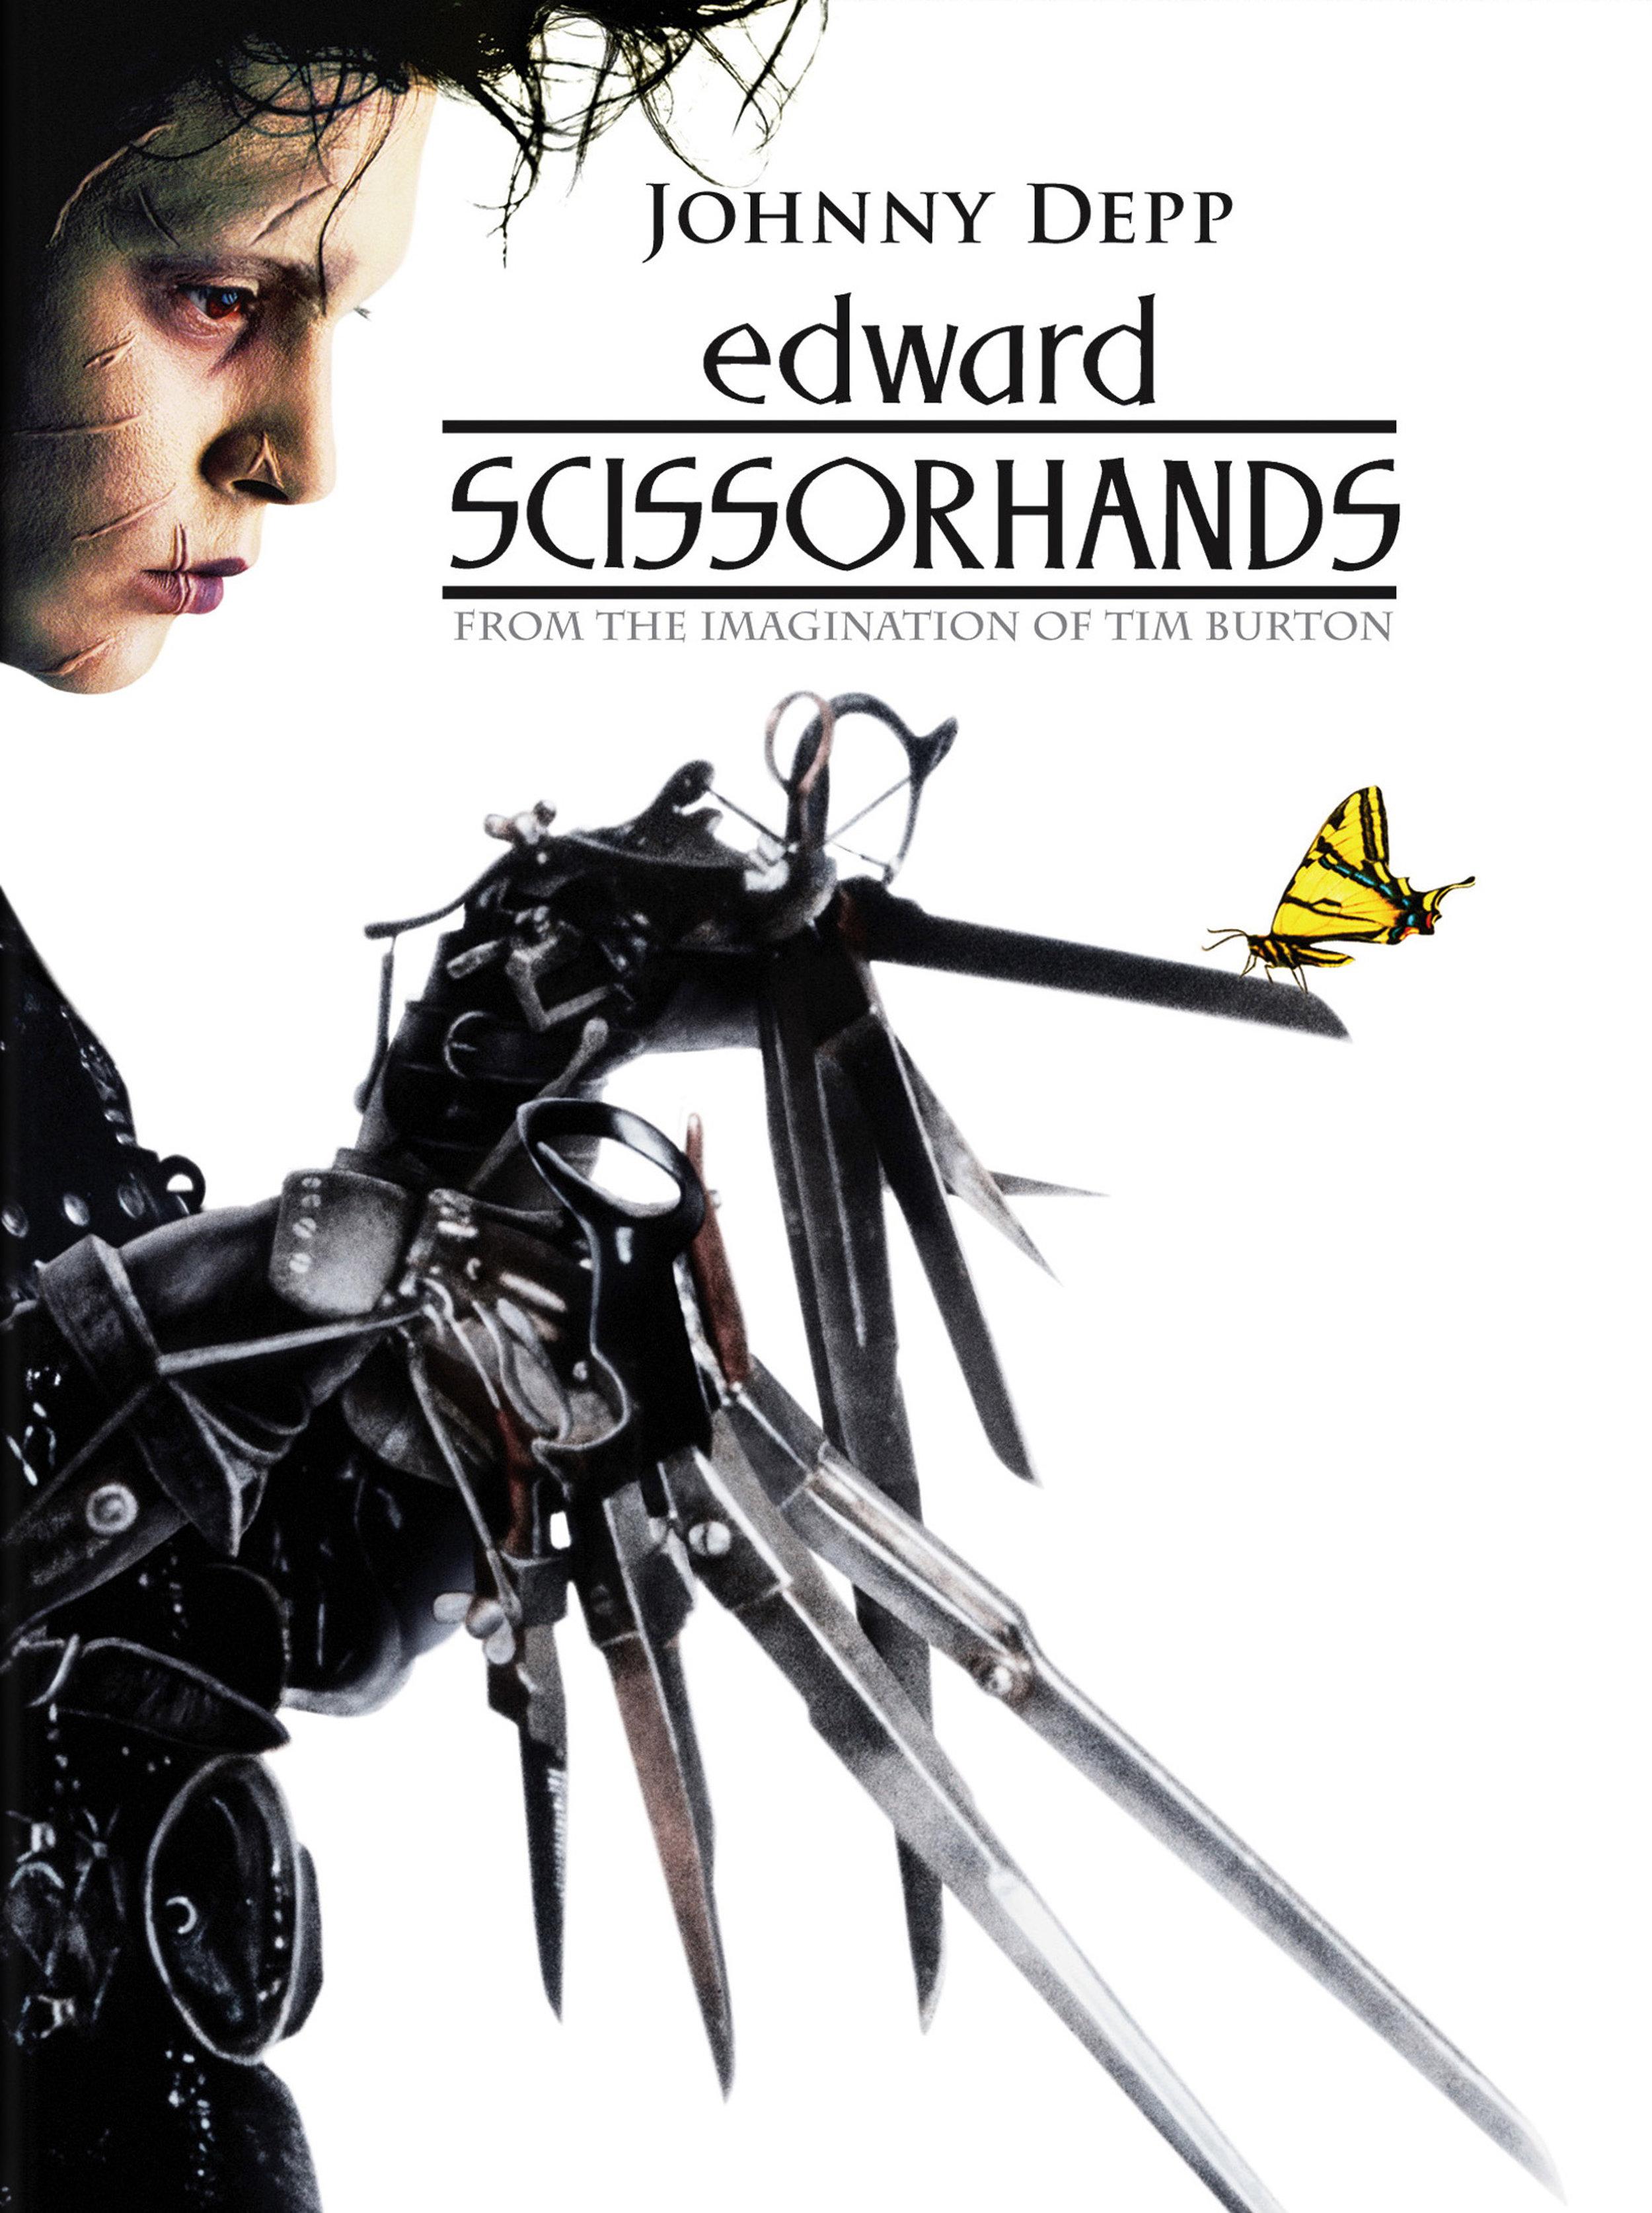 edwardscissorhands.jpg